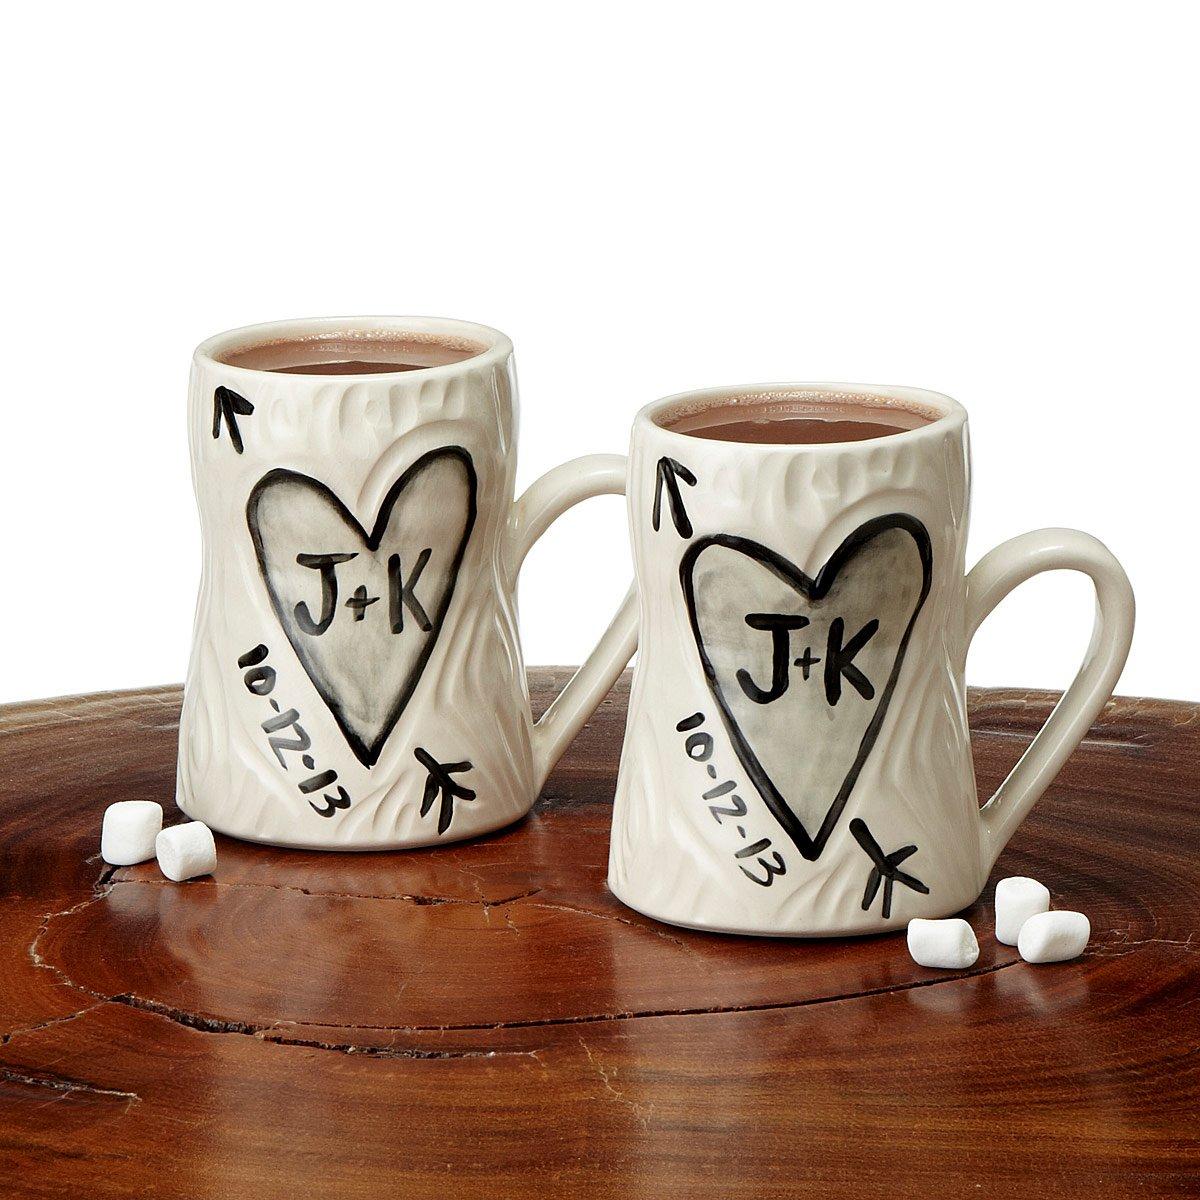 personalized porcelain faux bois mug set  ceramic coffee cups  - personalized porcelain faux bois mug set  thumbnail